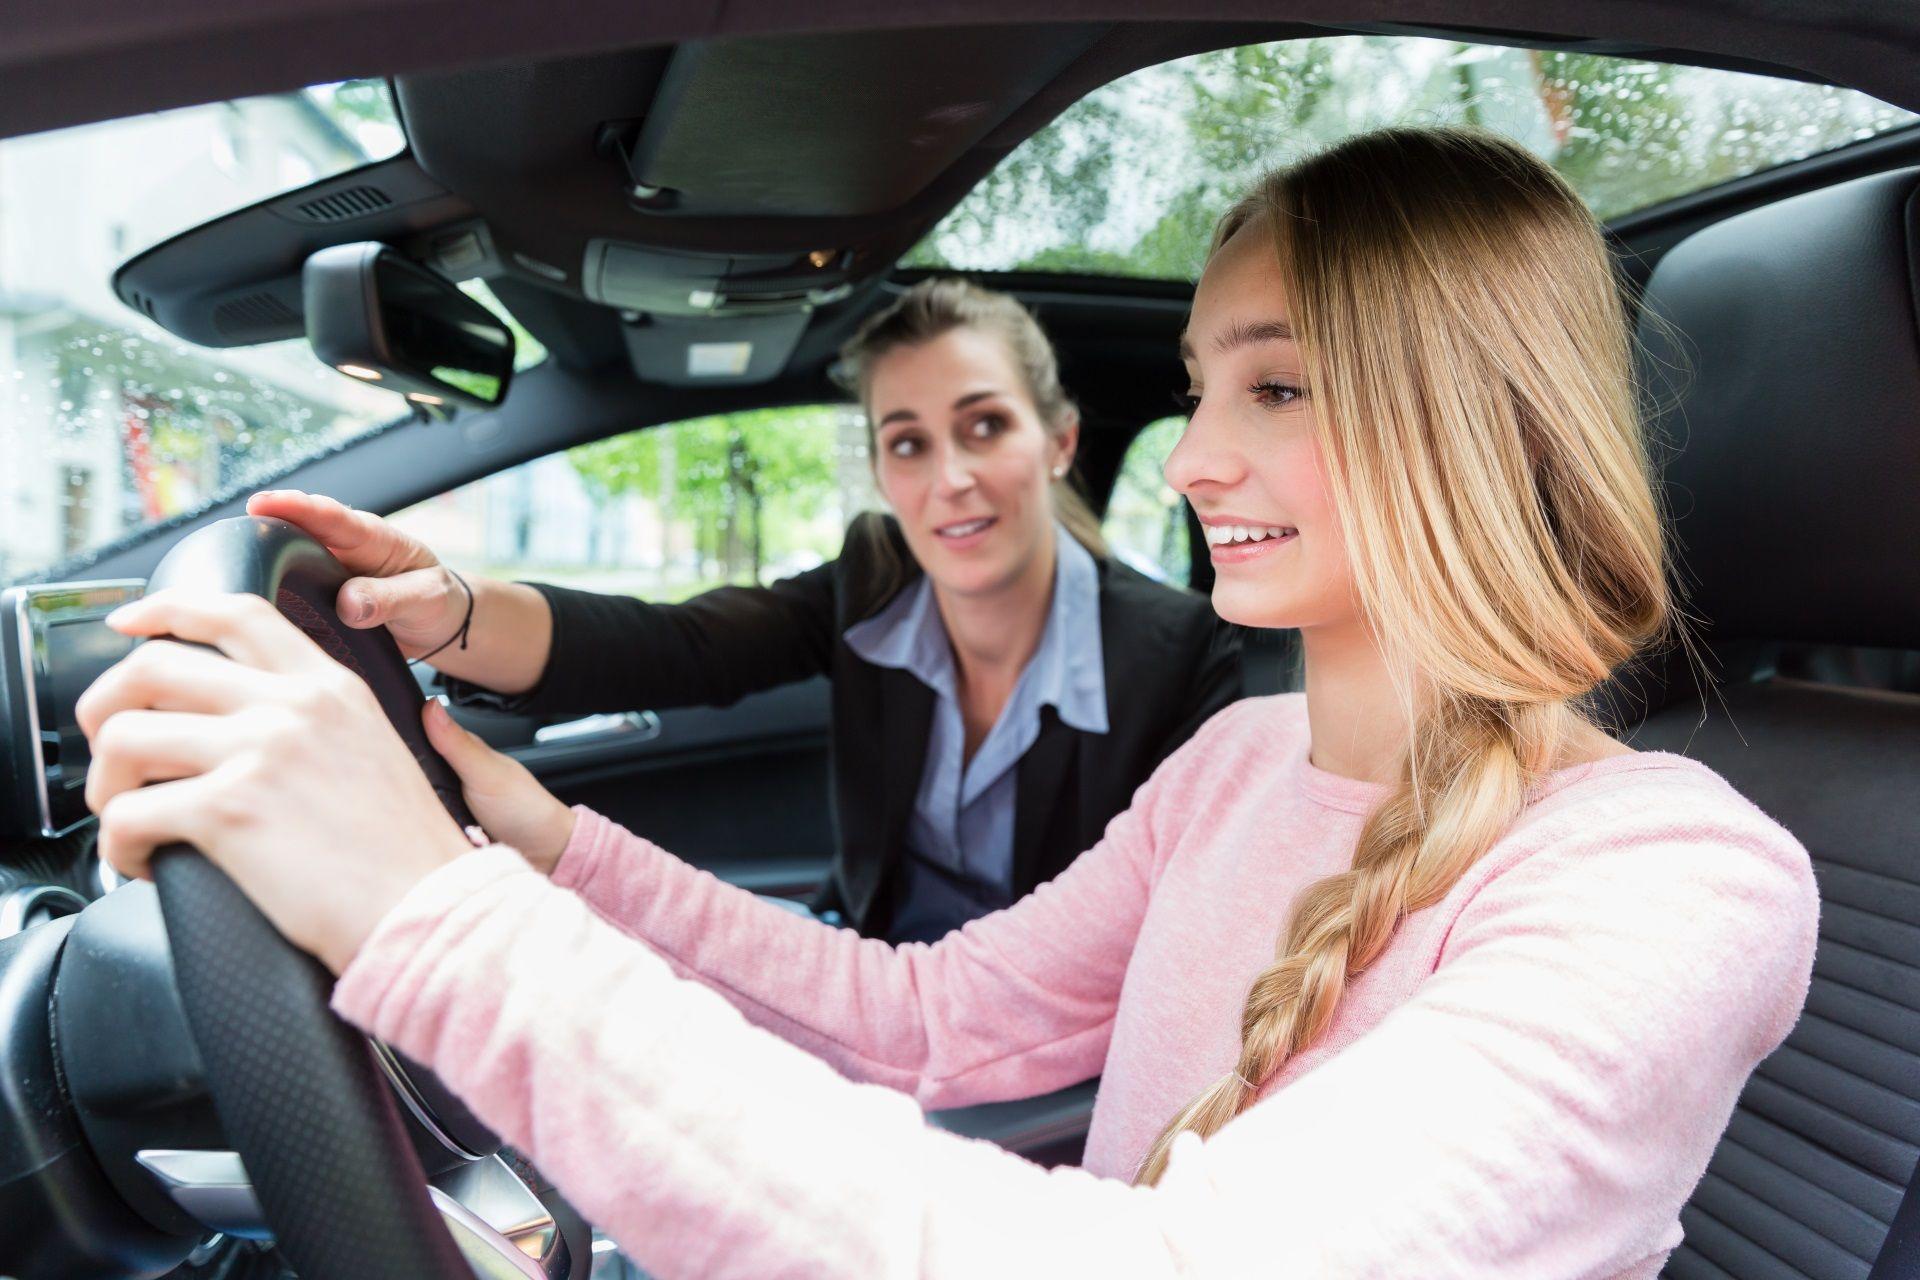 Una empleada vende un coche a una joven